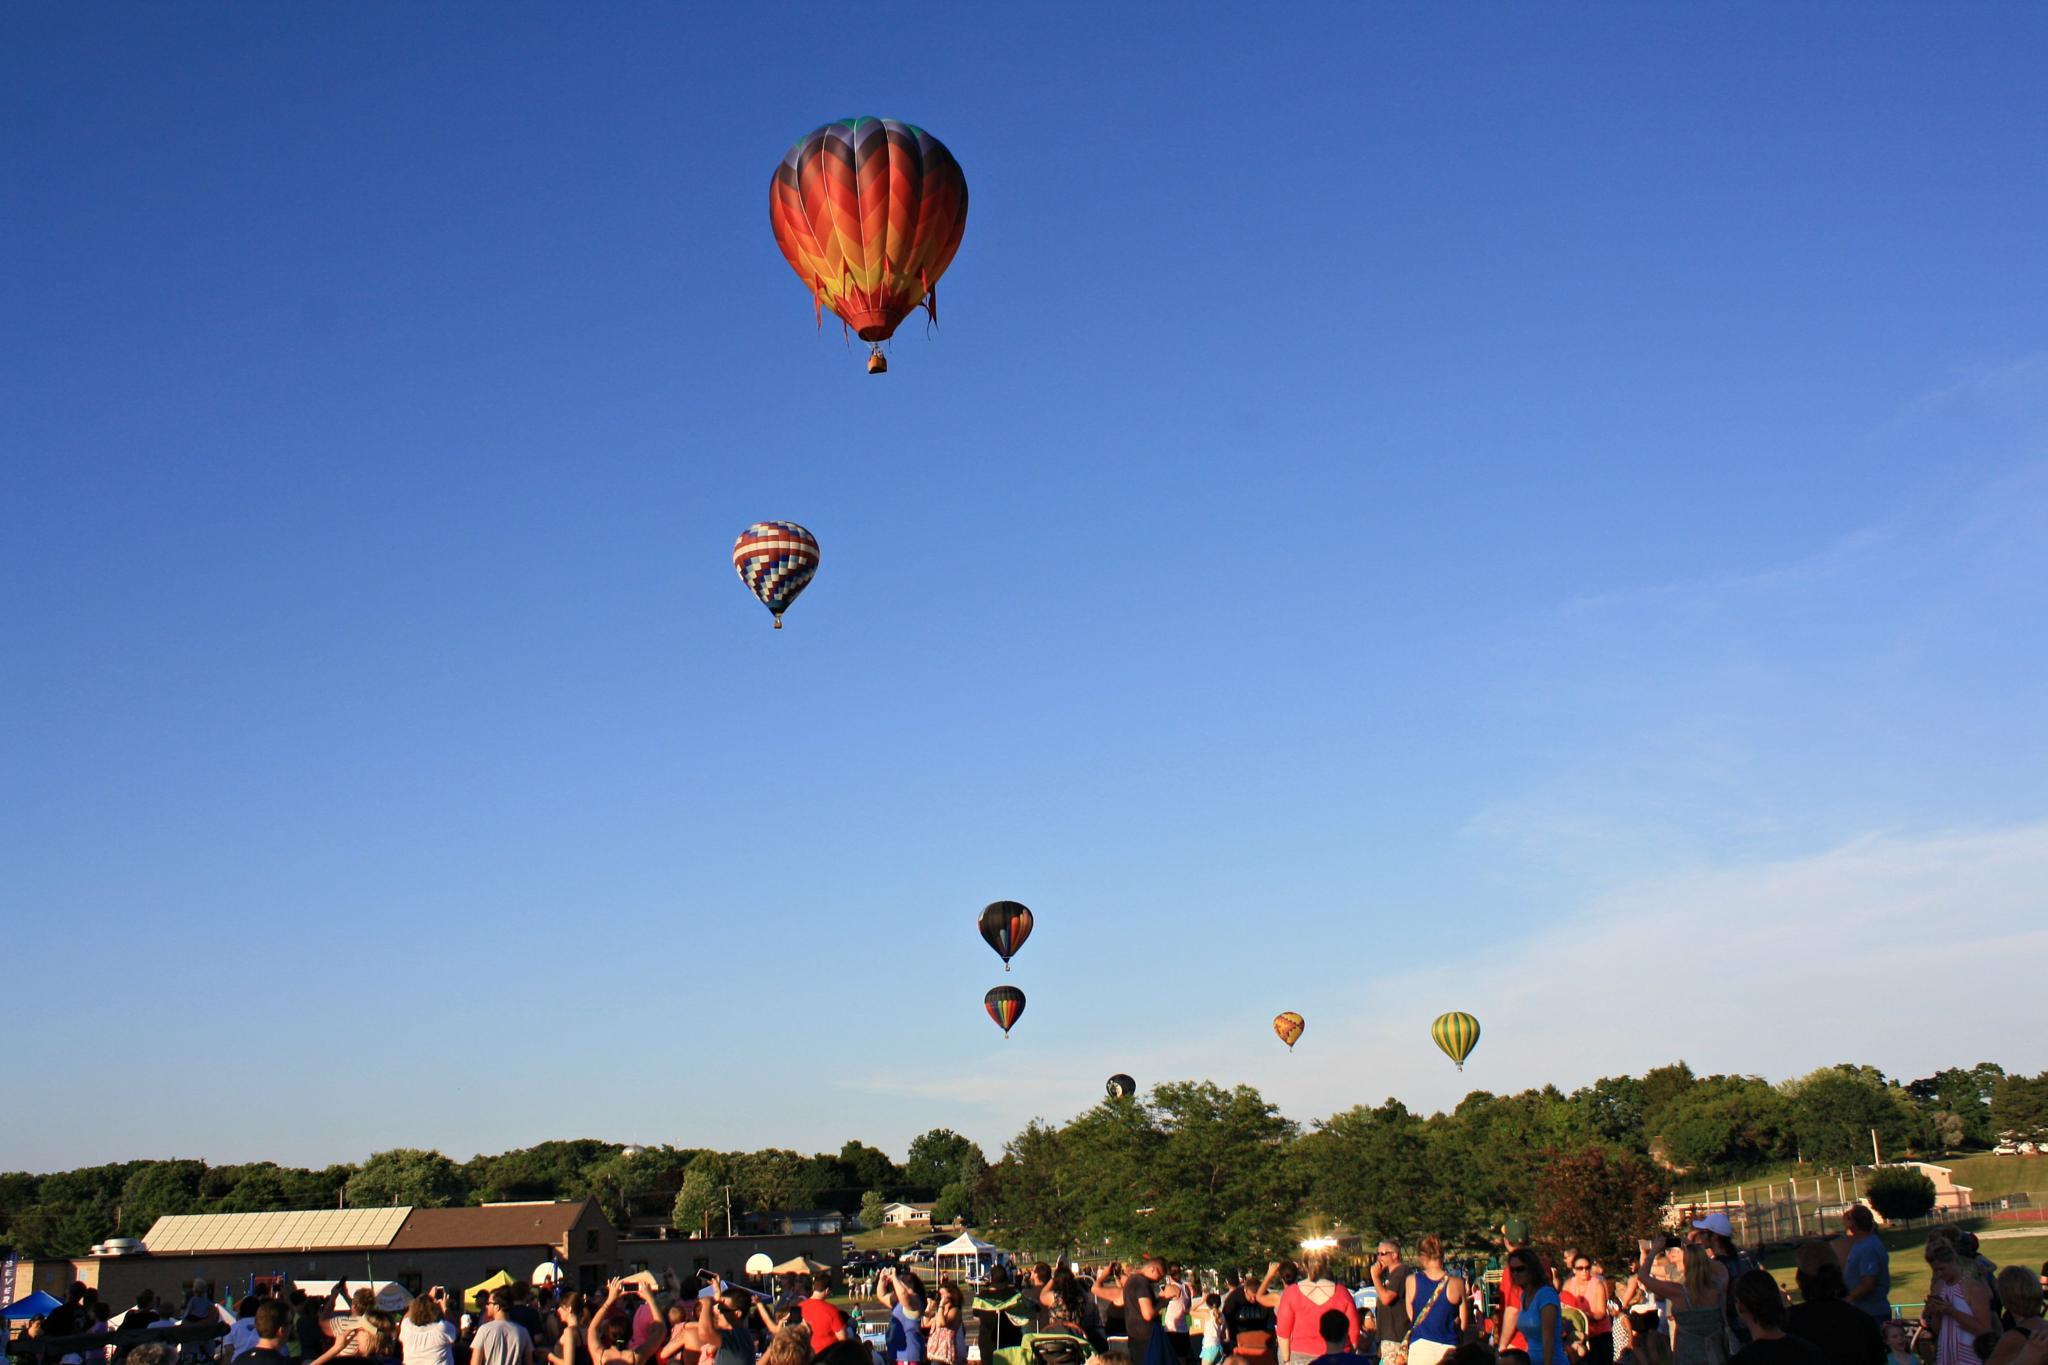 Balloon fest by veronica.clarksanders